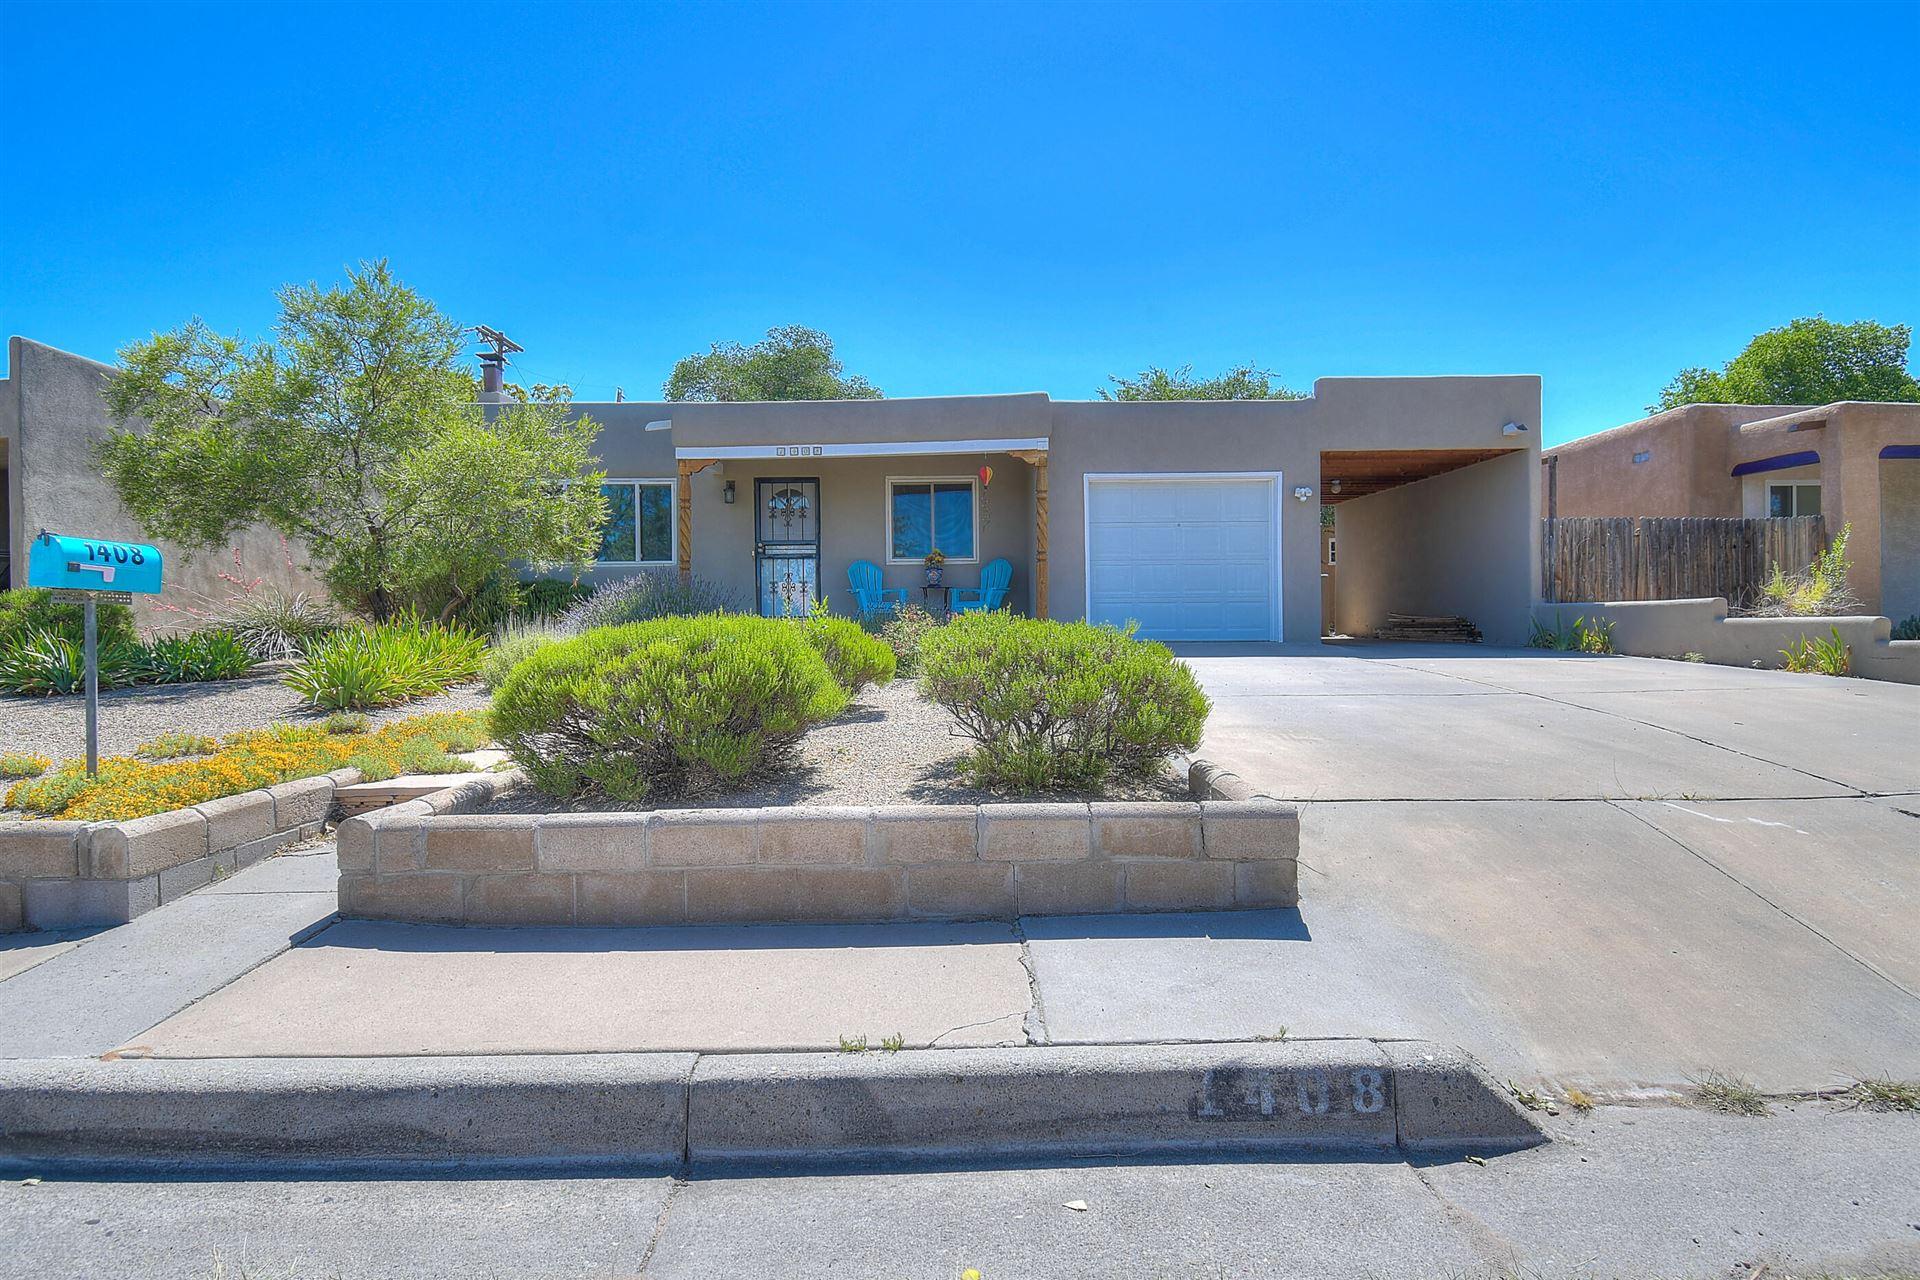 Photo of 1408 PRINCETON Drive SE, Albuquerque, NM 87106 (MLS # 971715)